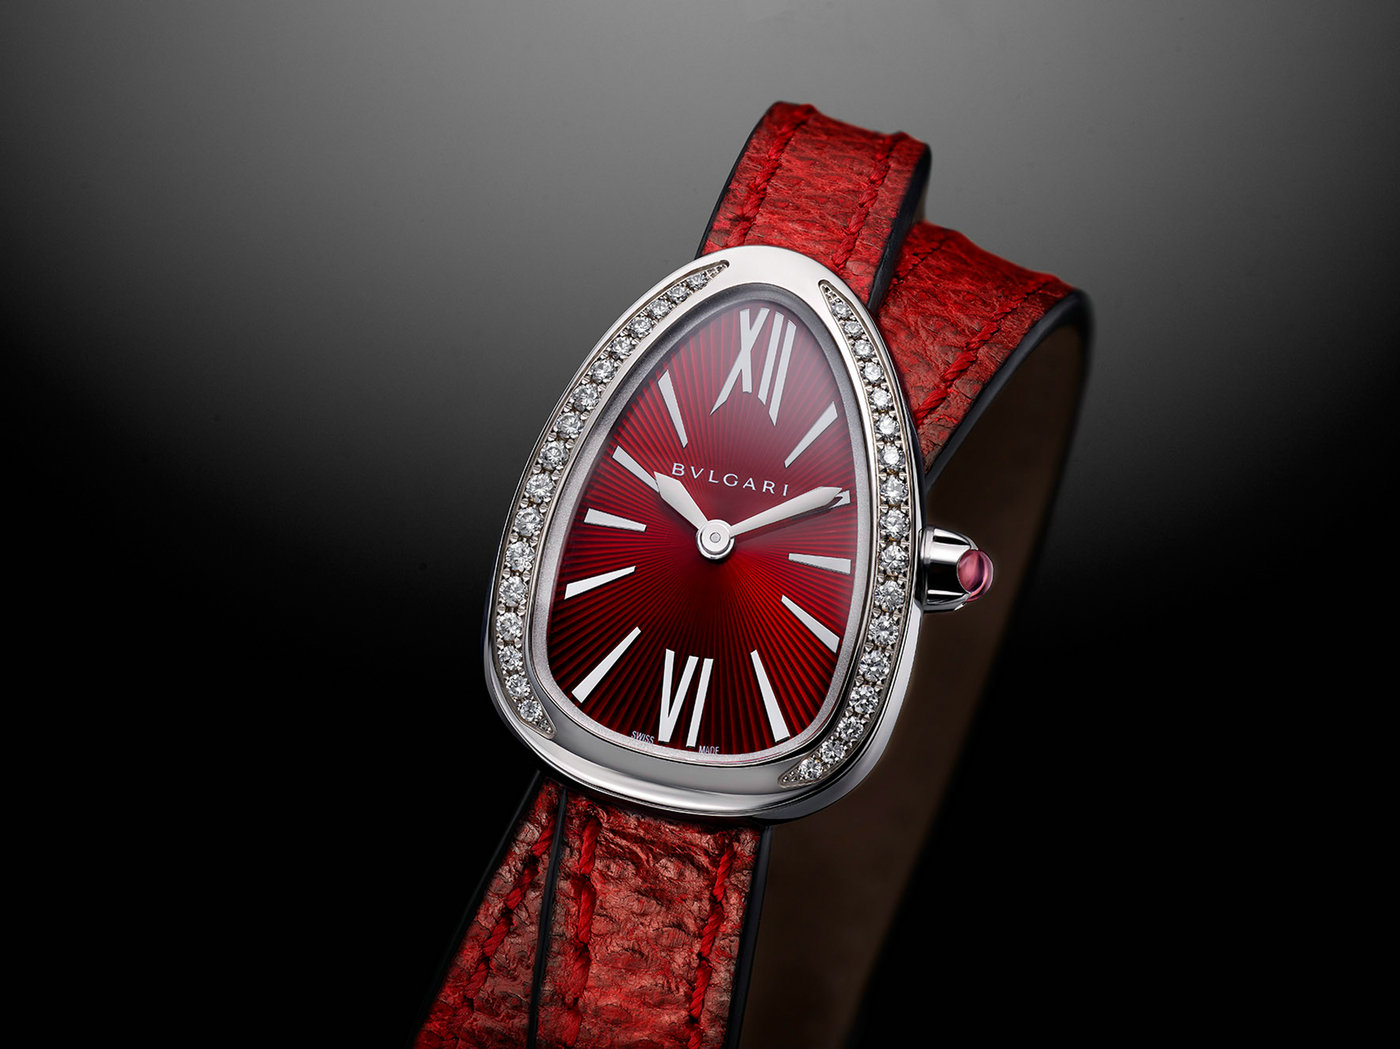 <b>二手宝格丽(BVLGARI)手表有回收价值么?回收价高</b>